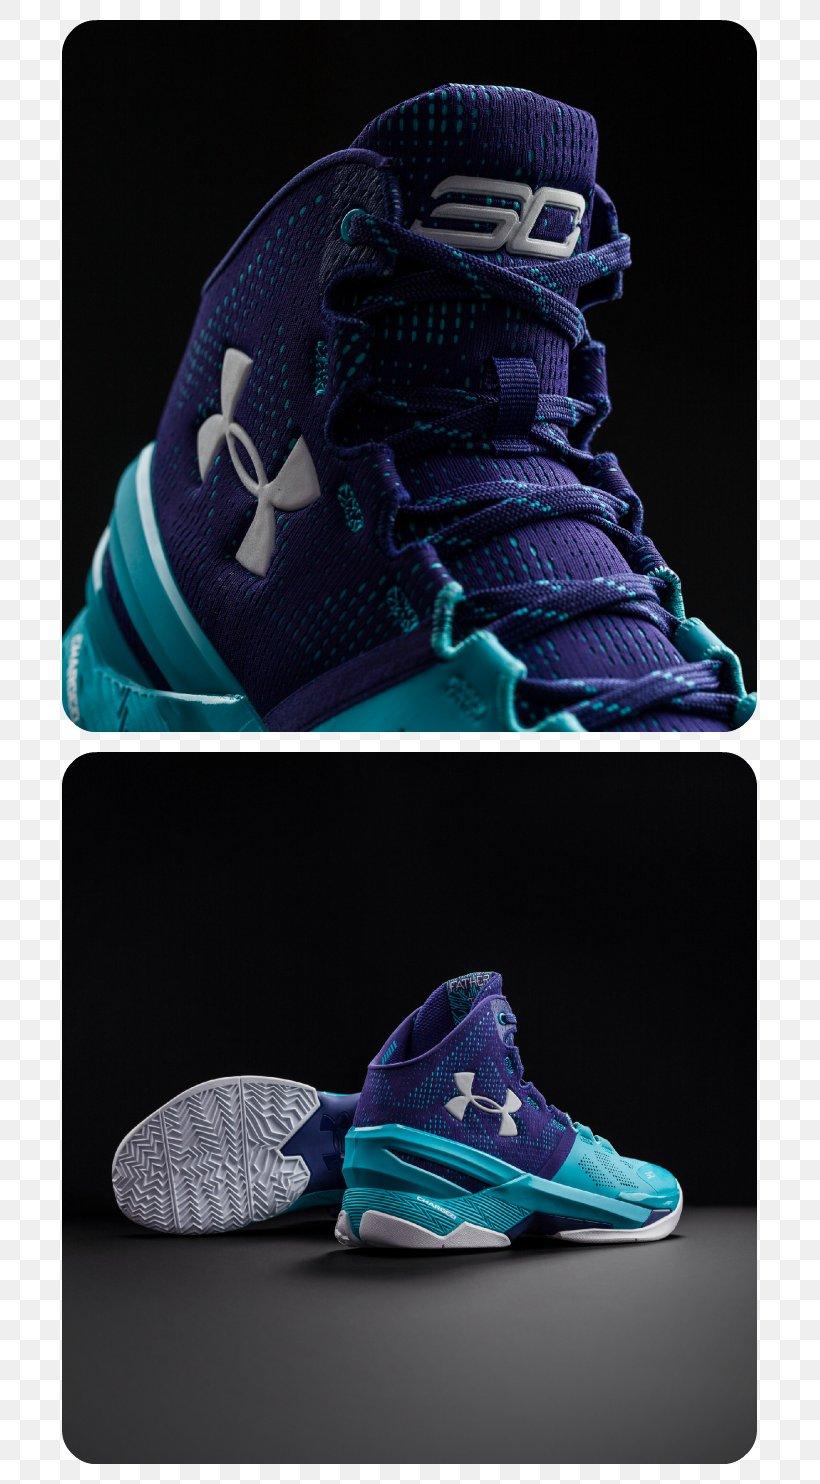 Sneakers T-shirt Nike Air Max Shoe, PNG, 735x1484px, Sneakers, Adidas, Aqua, Athletic Shoe, Azure Download Free